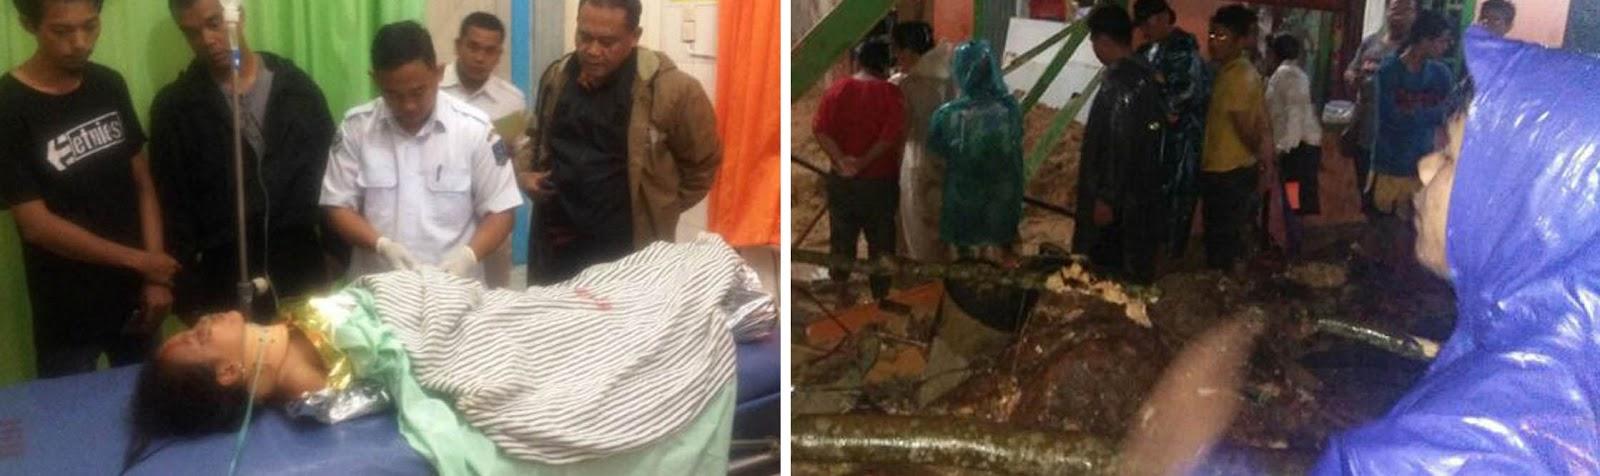 Jenazah ibu hamil yang tewas tertimpa longsor di Sibolga,